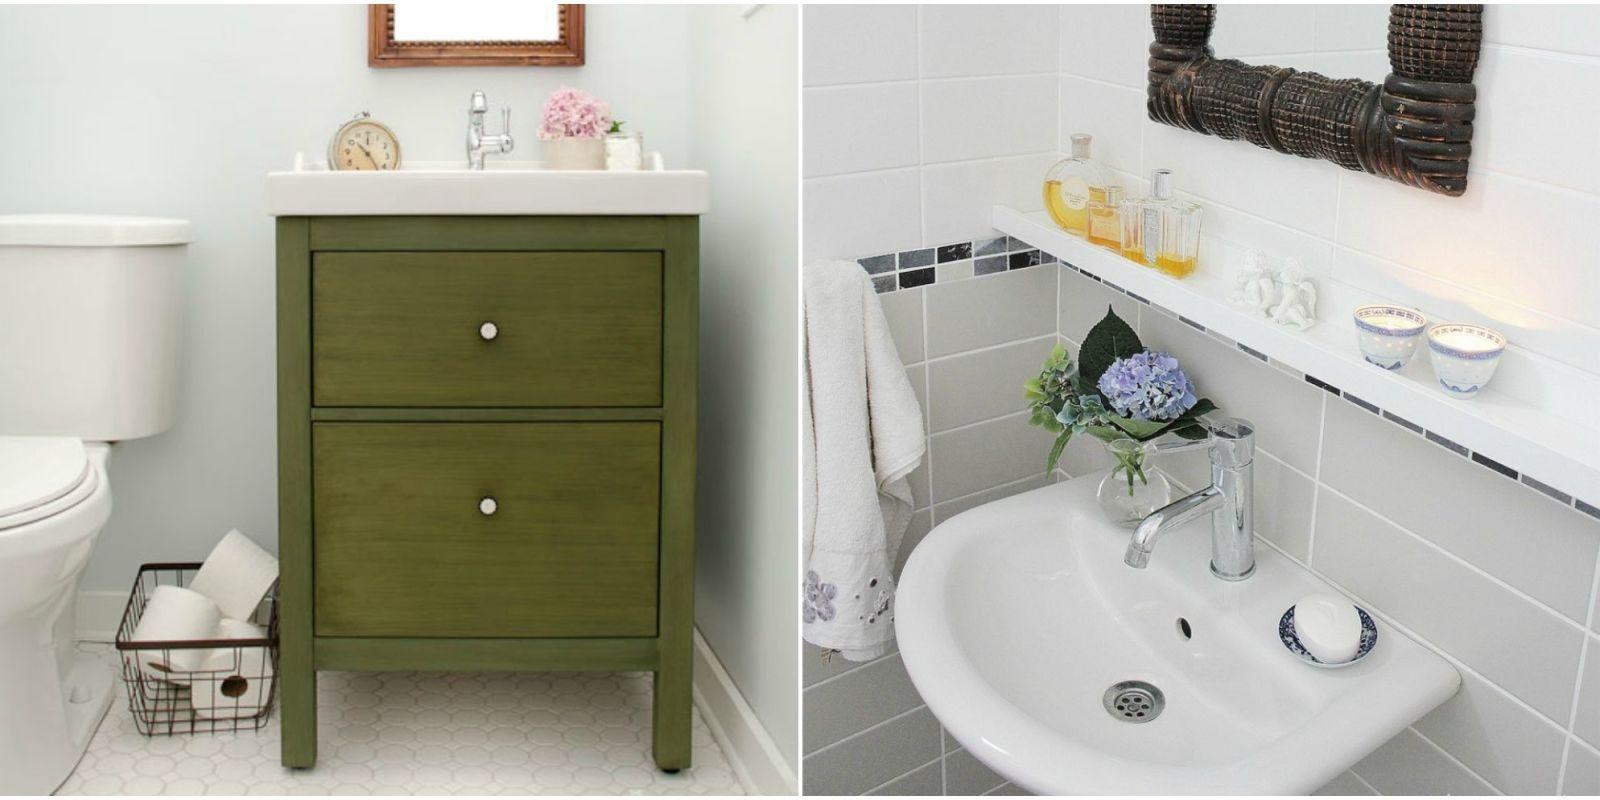 11 Ikea Bathroom Hacks  New Uses For Ikea Items In The